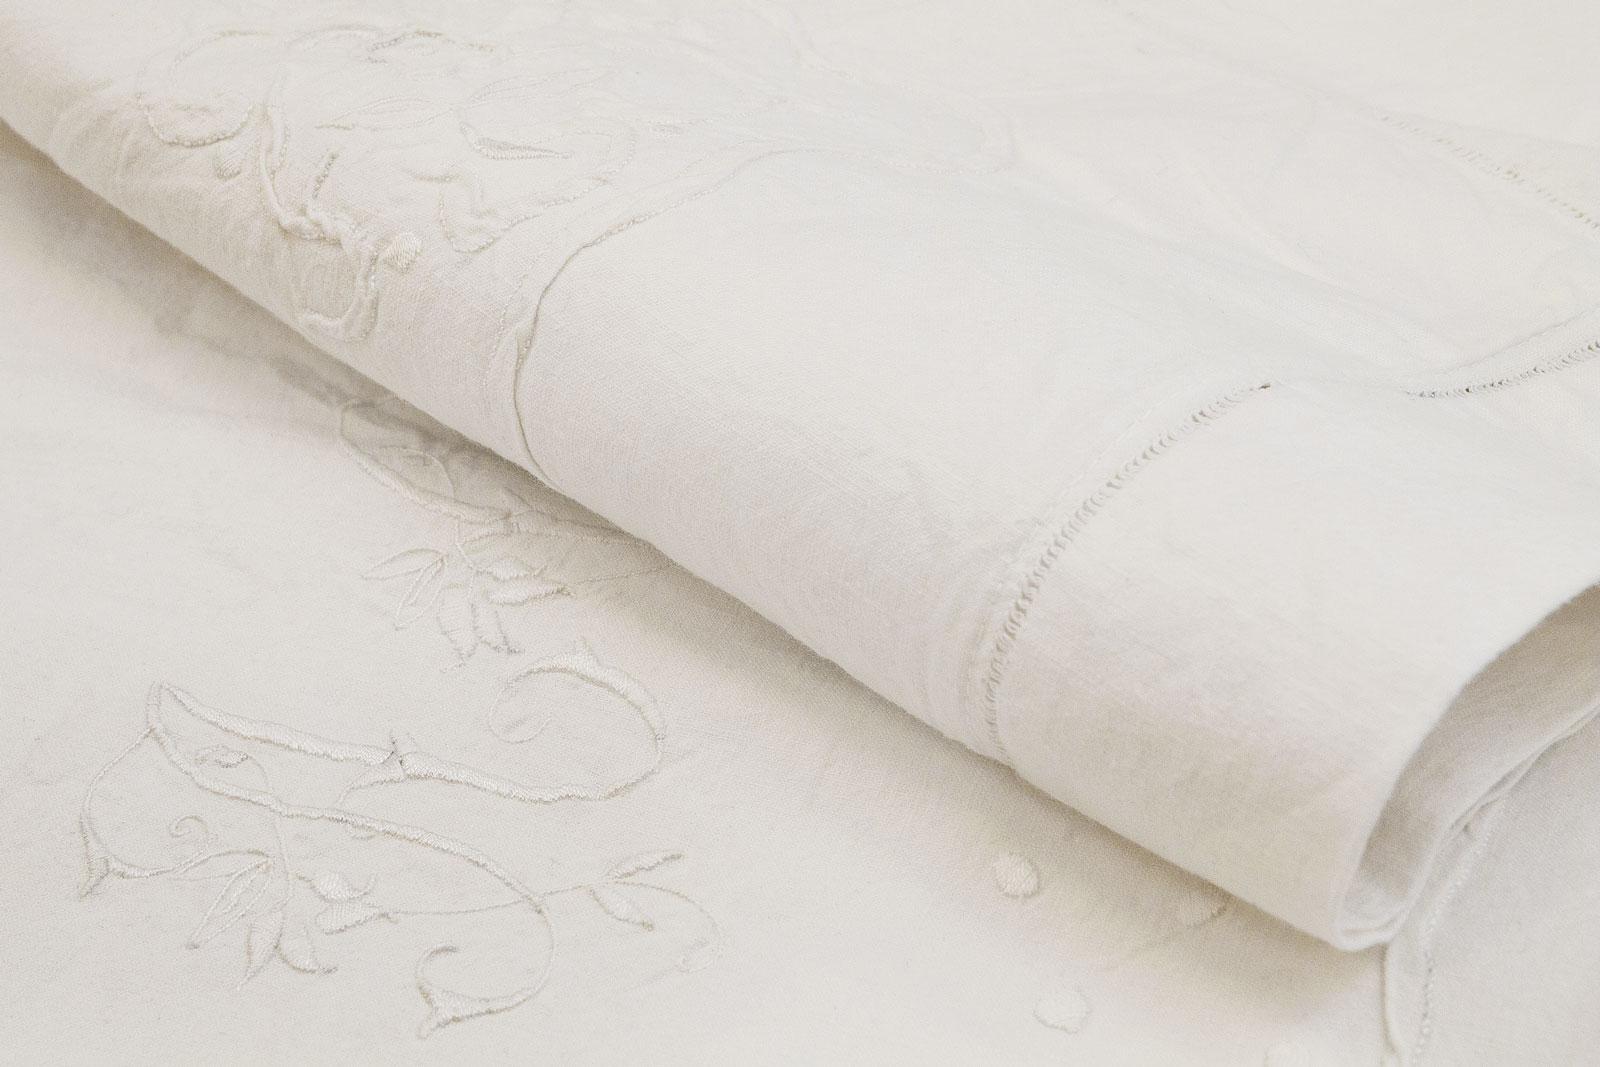 Fiorella floreal vintage duvet cover